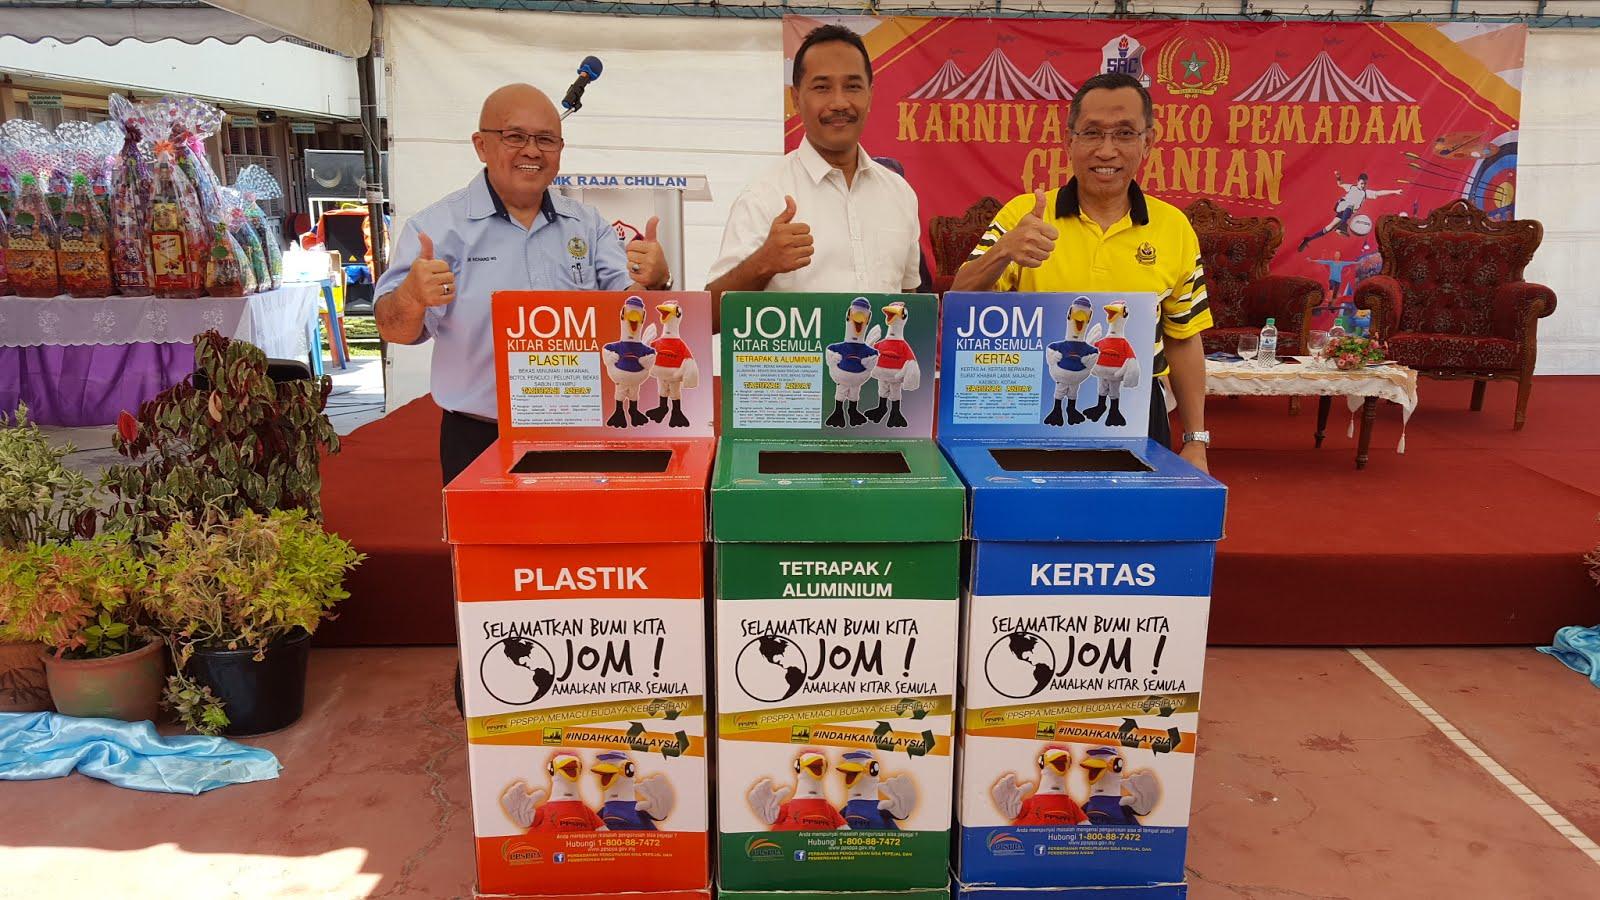 MOU signing with SMK Raja Chulan